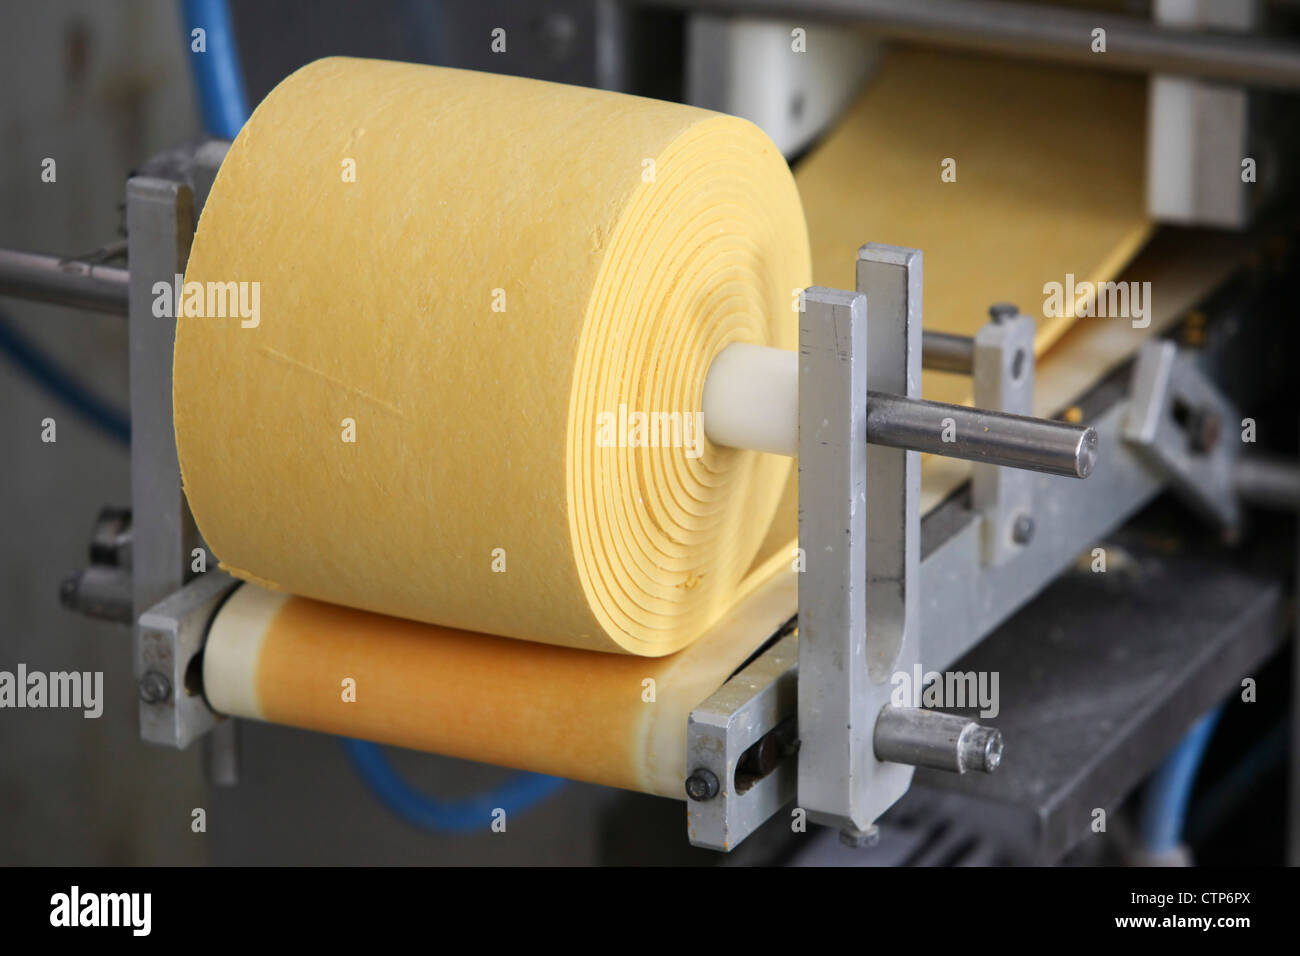 Ravioli production line - Stock Image